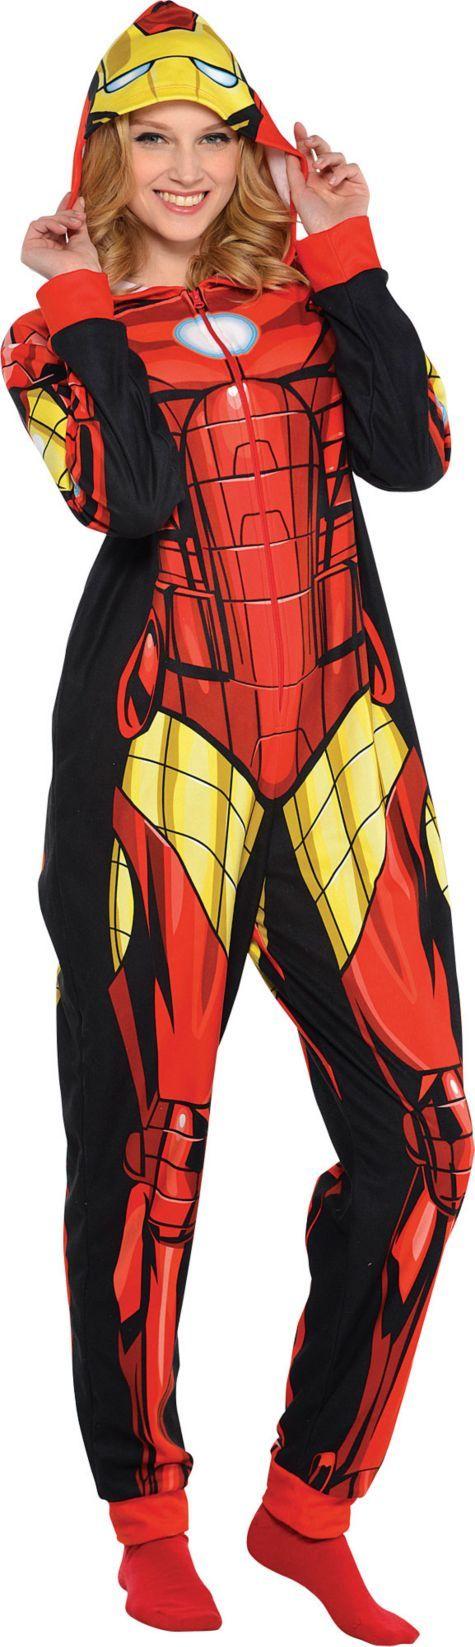 Adult Iron Man One Piece Pajama - Party City